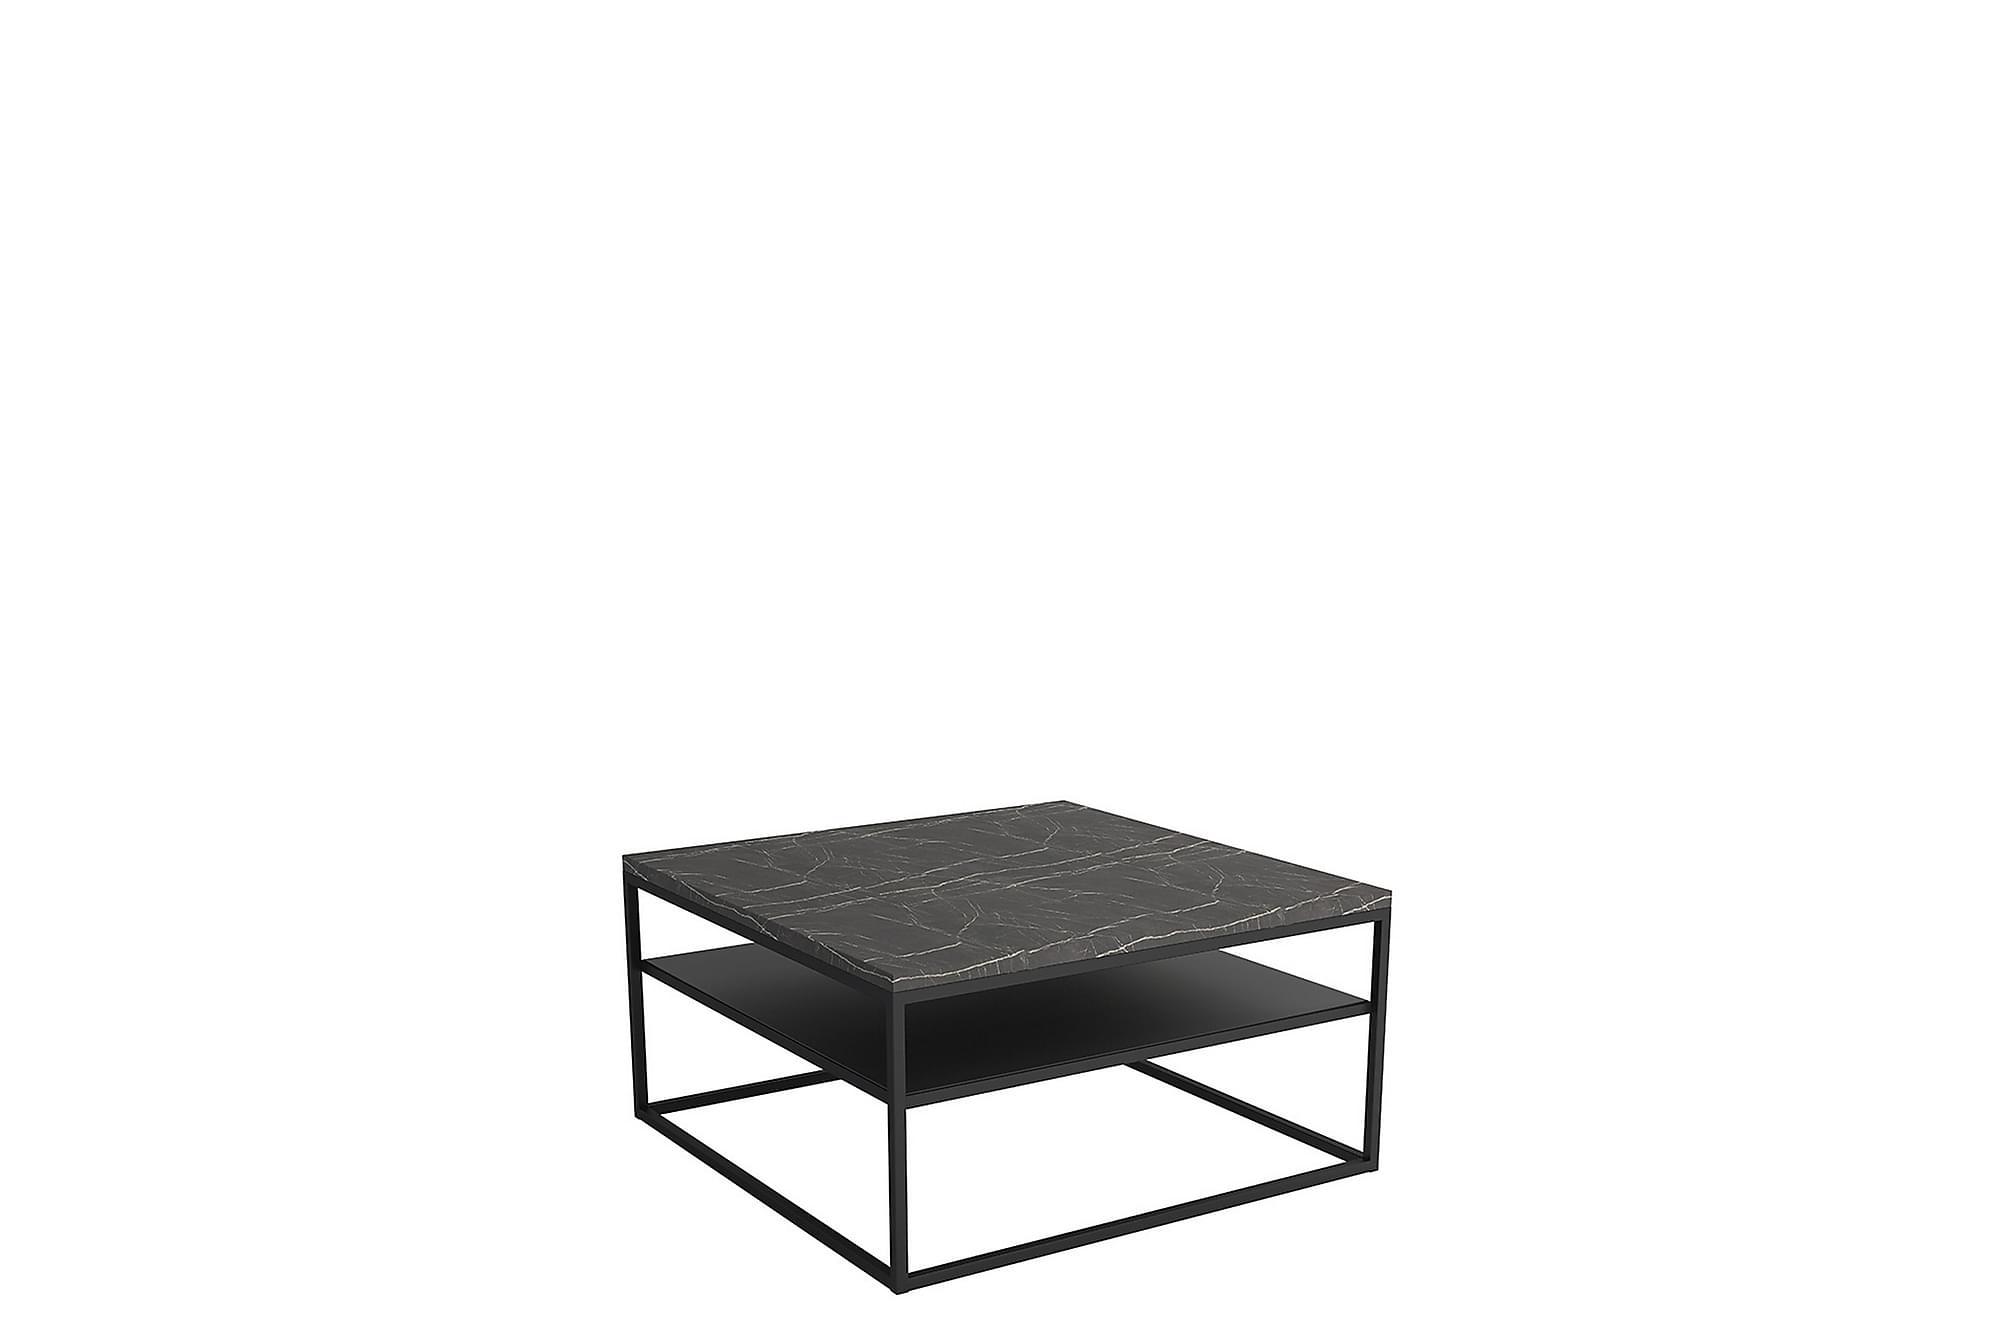 Northleach soffbord 85 cm marmor/svart